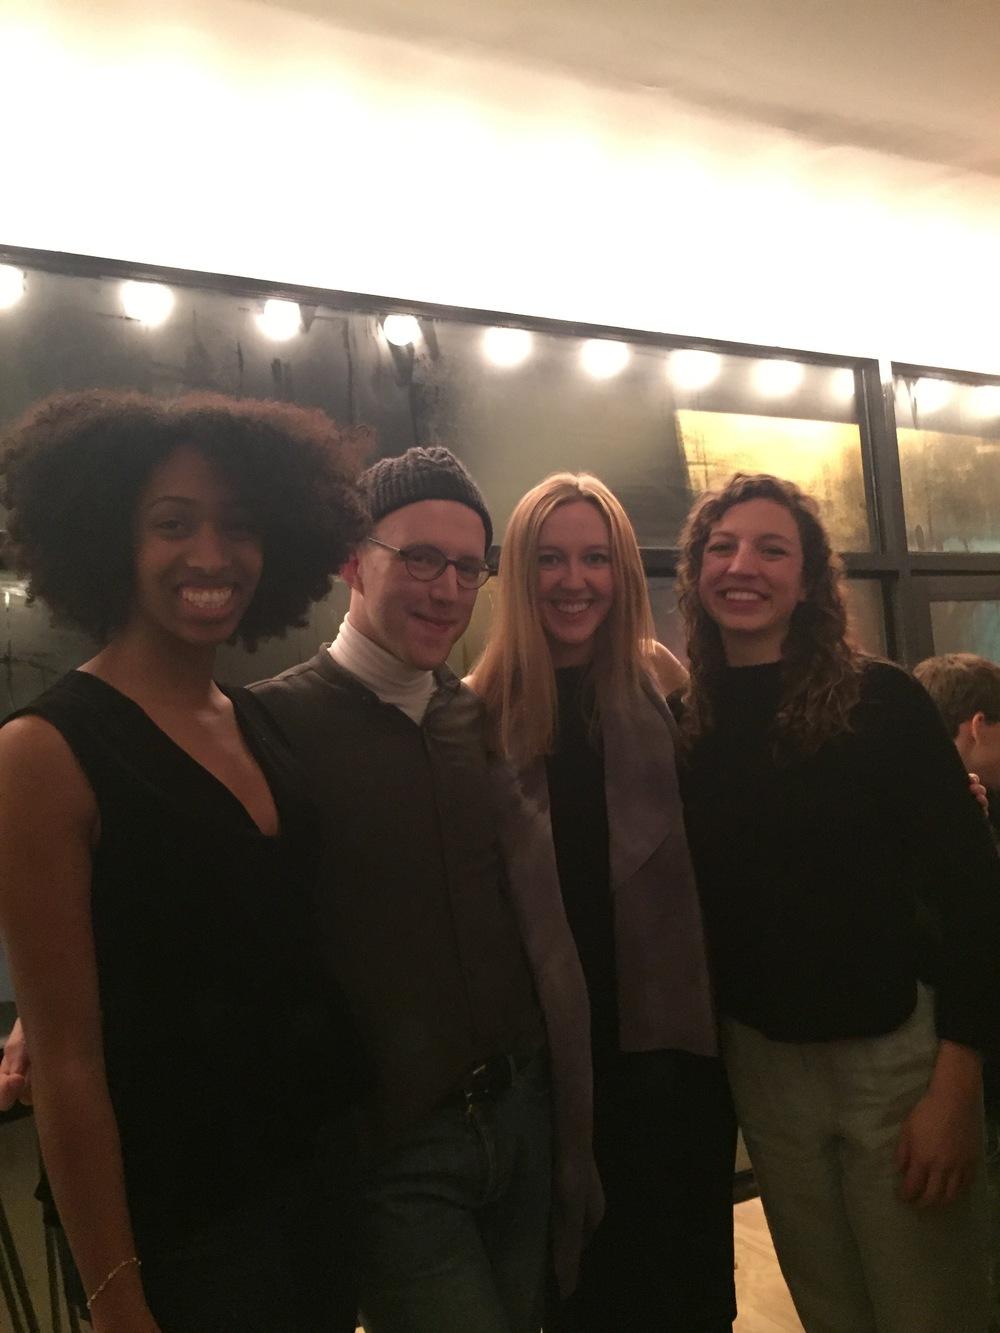 Coordinators:Jordan Bolden, Will Frazier, Victoria Kornick, and Jessie Marion Modi